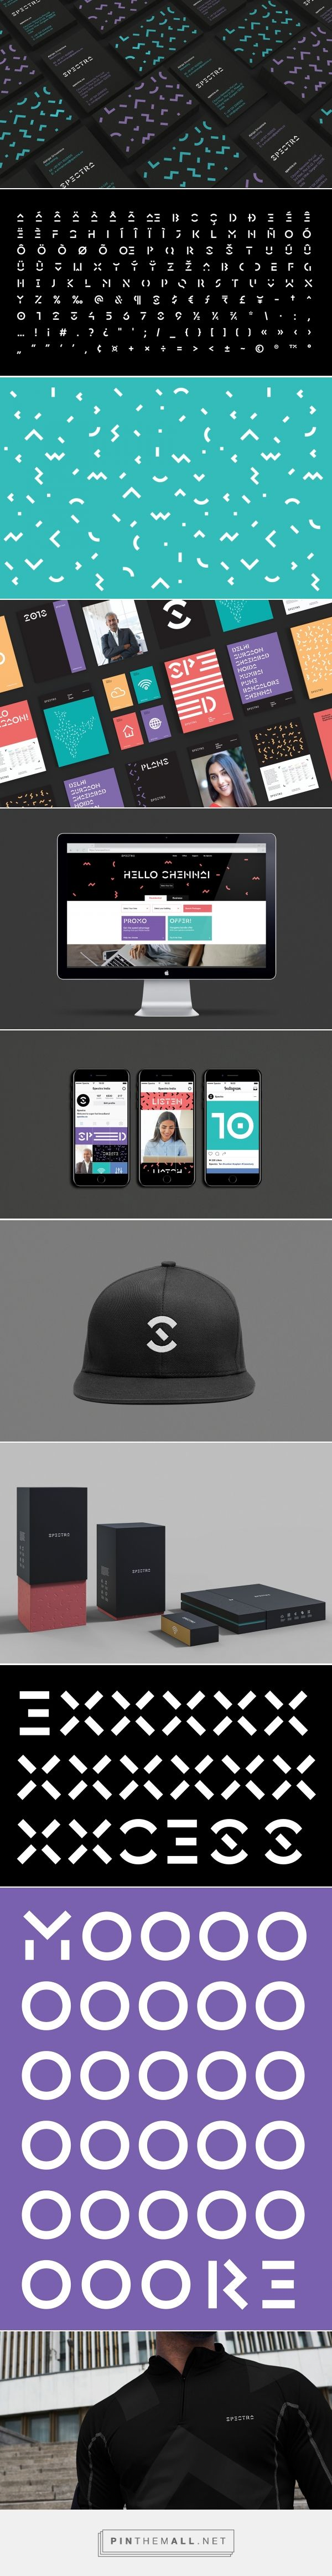 Spectra Broadband Service Provider Branding by Ryan Miglinczy | Fivestar Branding Agency – Design and Branding Agency & Curated Inspiration Gallery #designinspiration #design #branding #identity